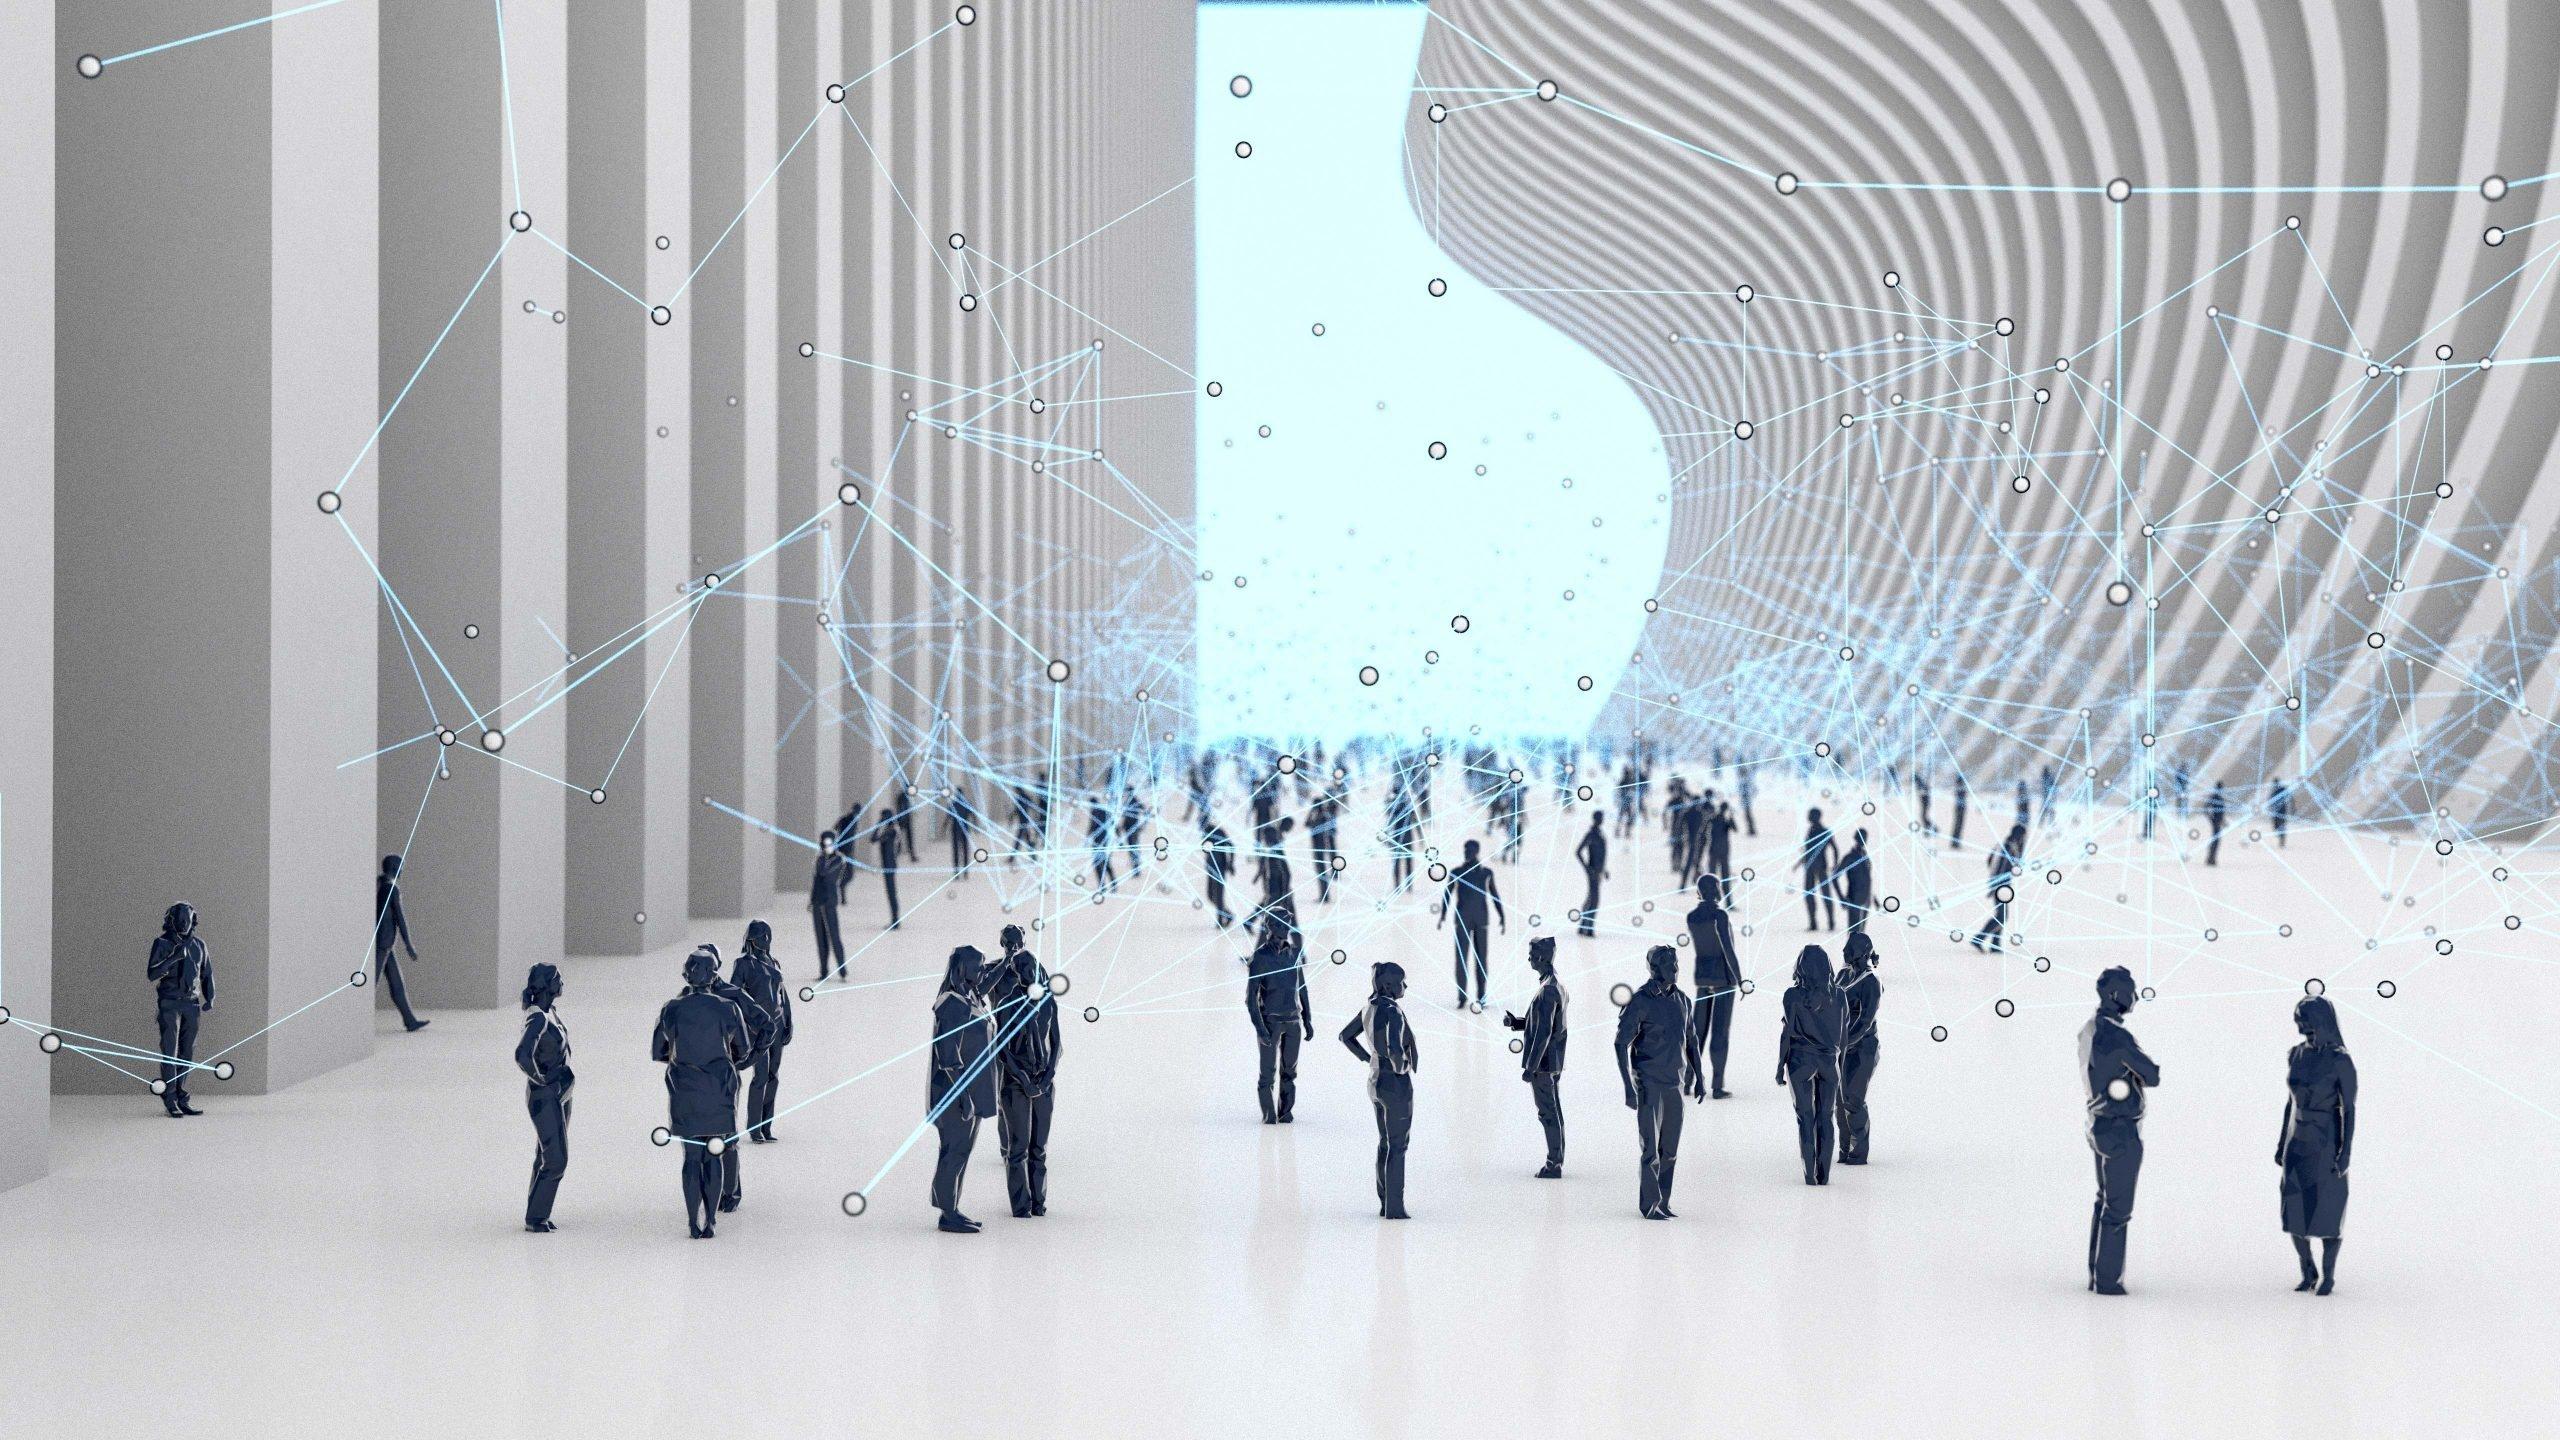 People in a futuristic building